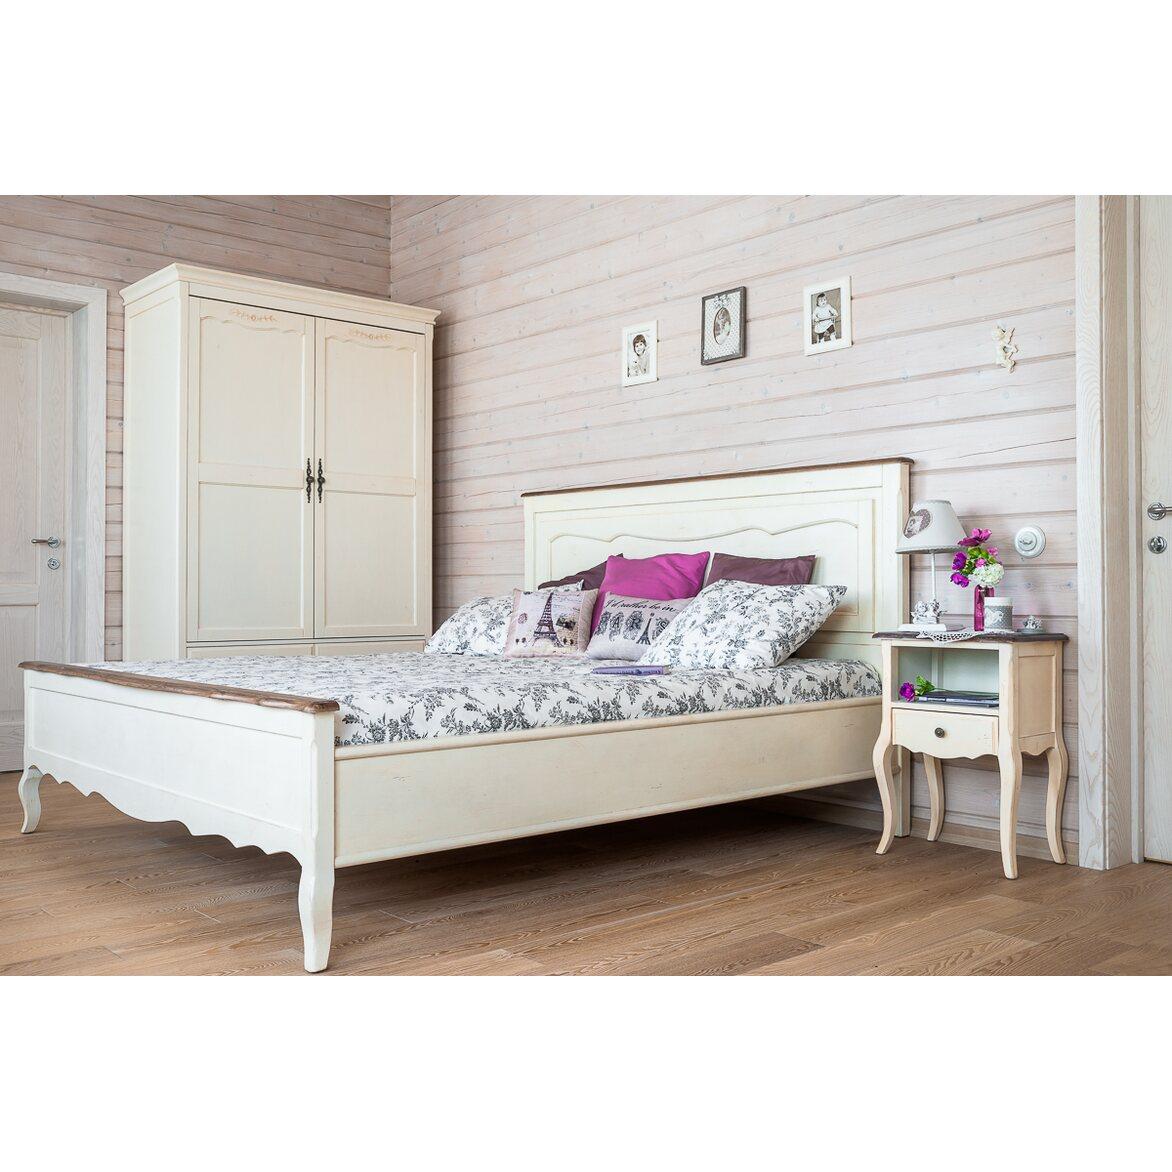 Шкаф двухстворчатый с 4-я ящиками Leontina, бежевого цвета 4 | Платяные шкафы Kingsby